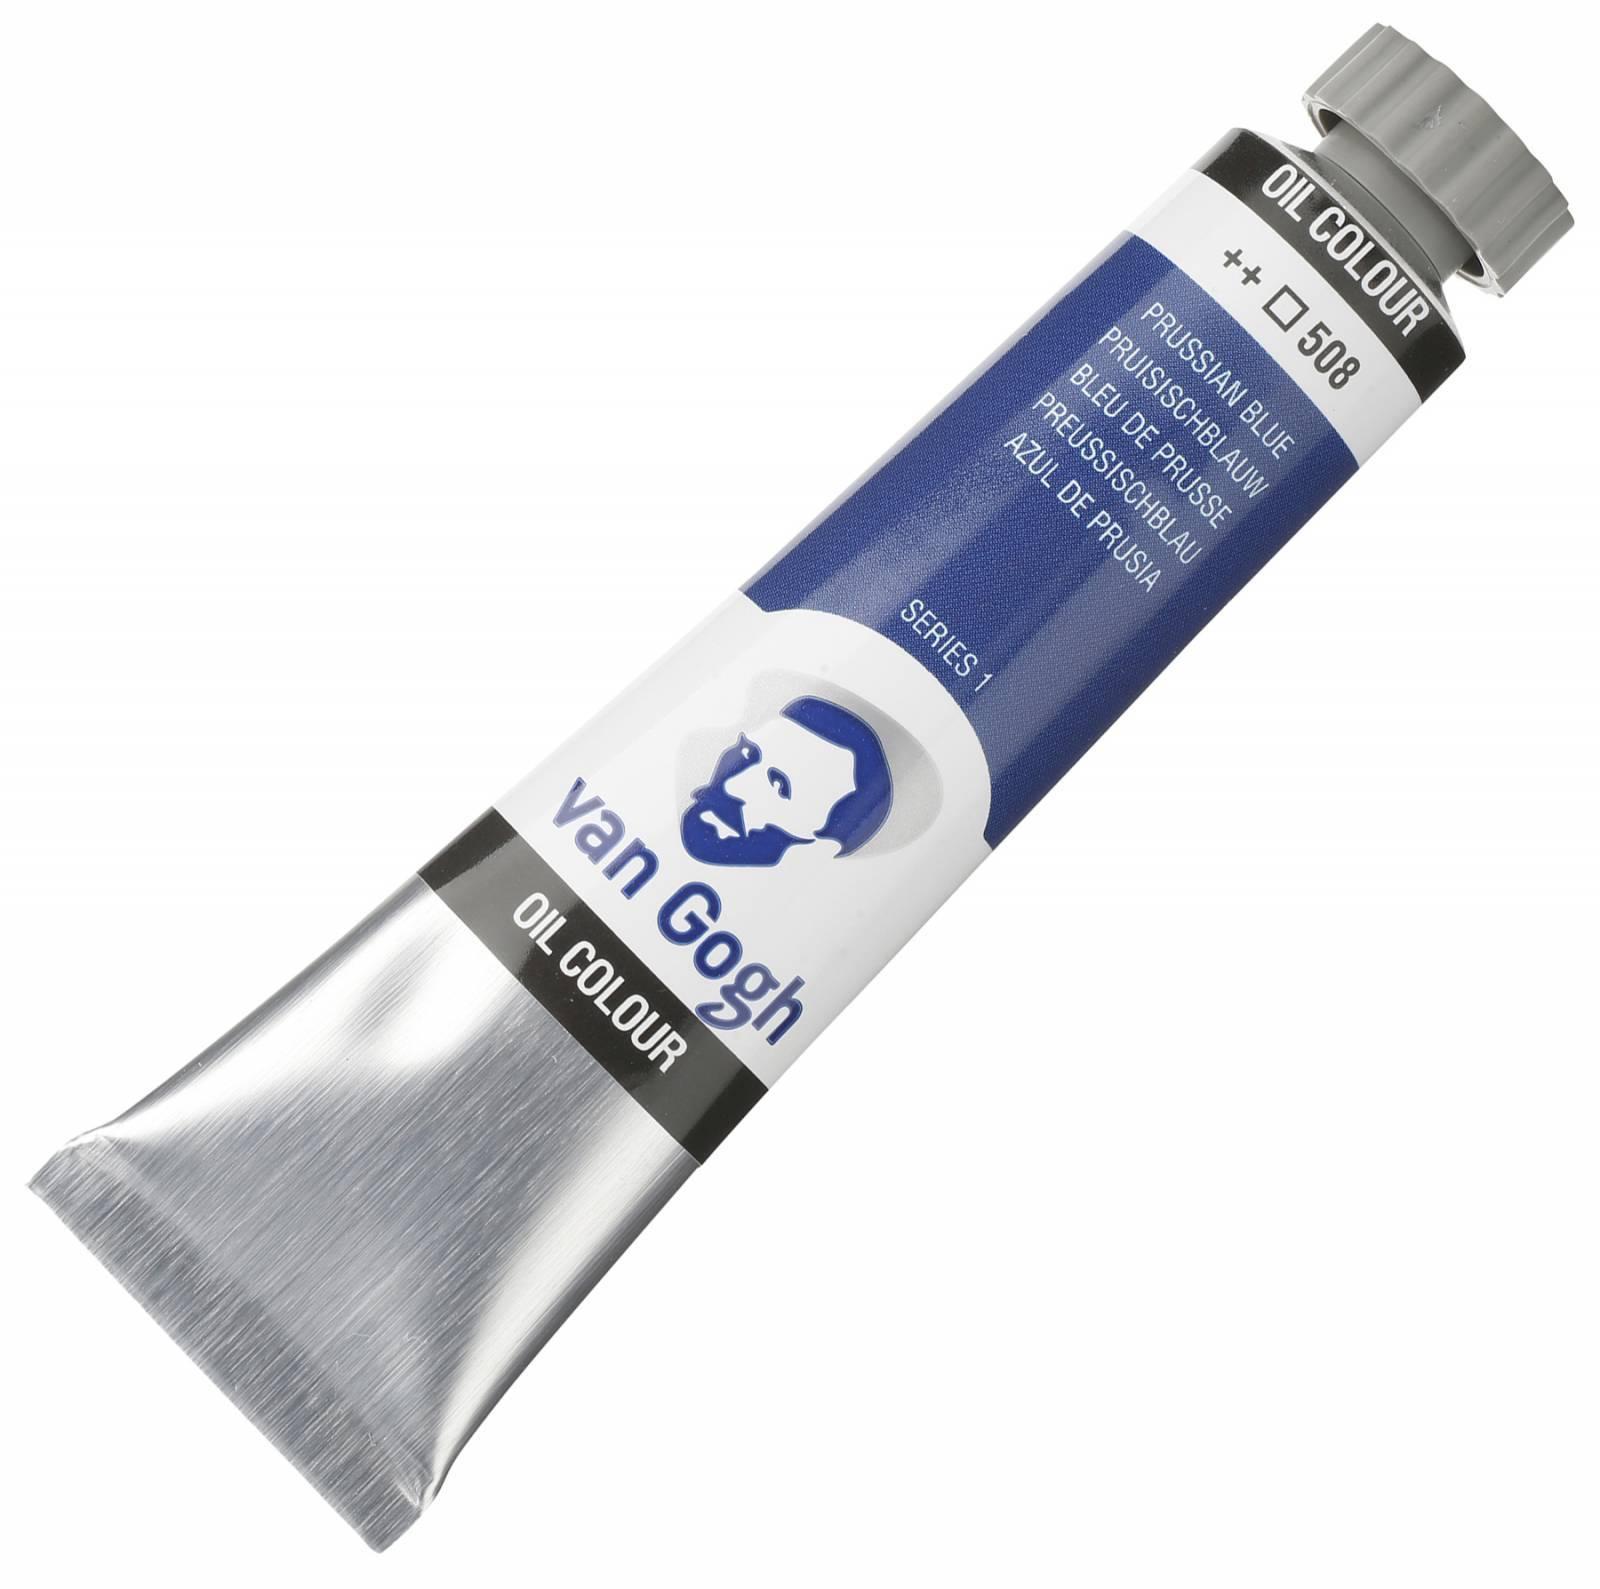 Oleo Van Gogh Prussian blue ++508 - serie 1 - Tubo 20ml - Papelaria Botafogo